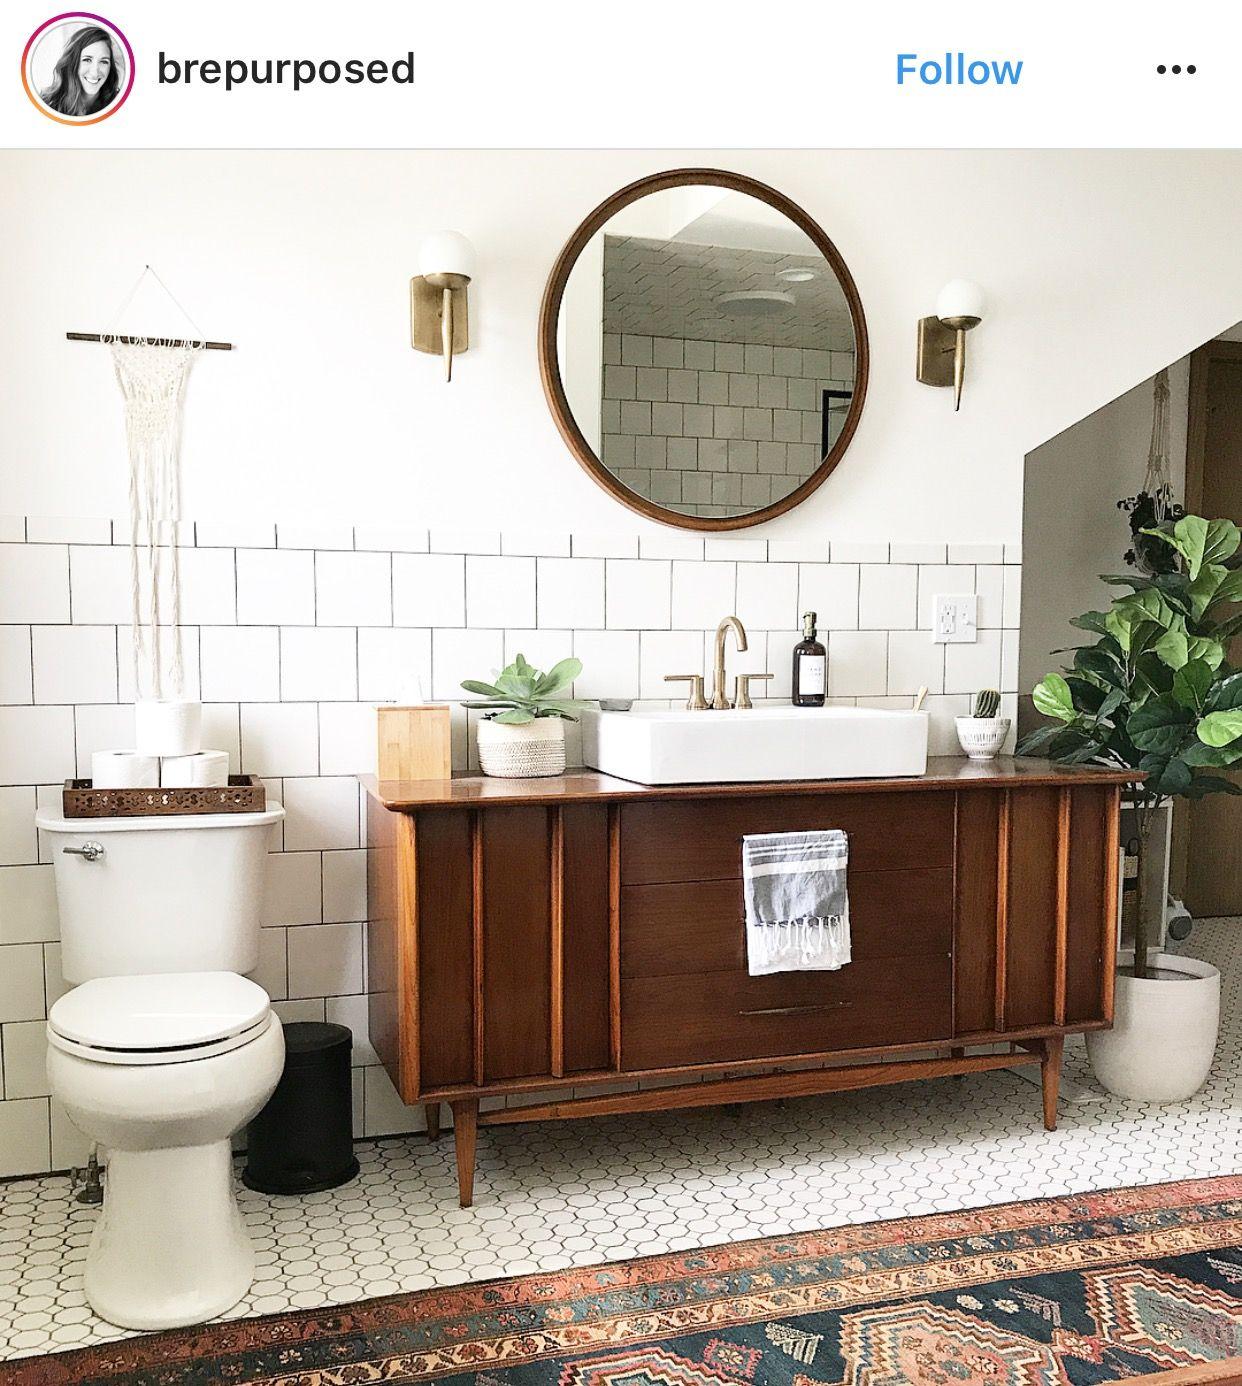 Vintage bathroom interior pin by rebecca bateman on living ideas  pinterest  bath and interiors